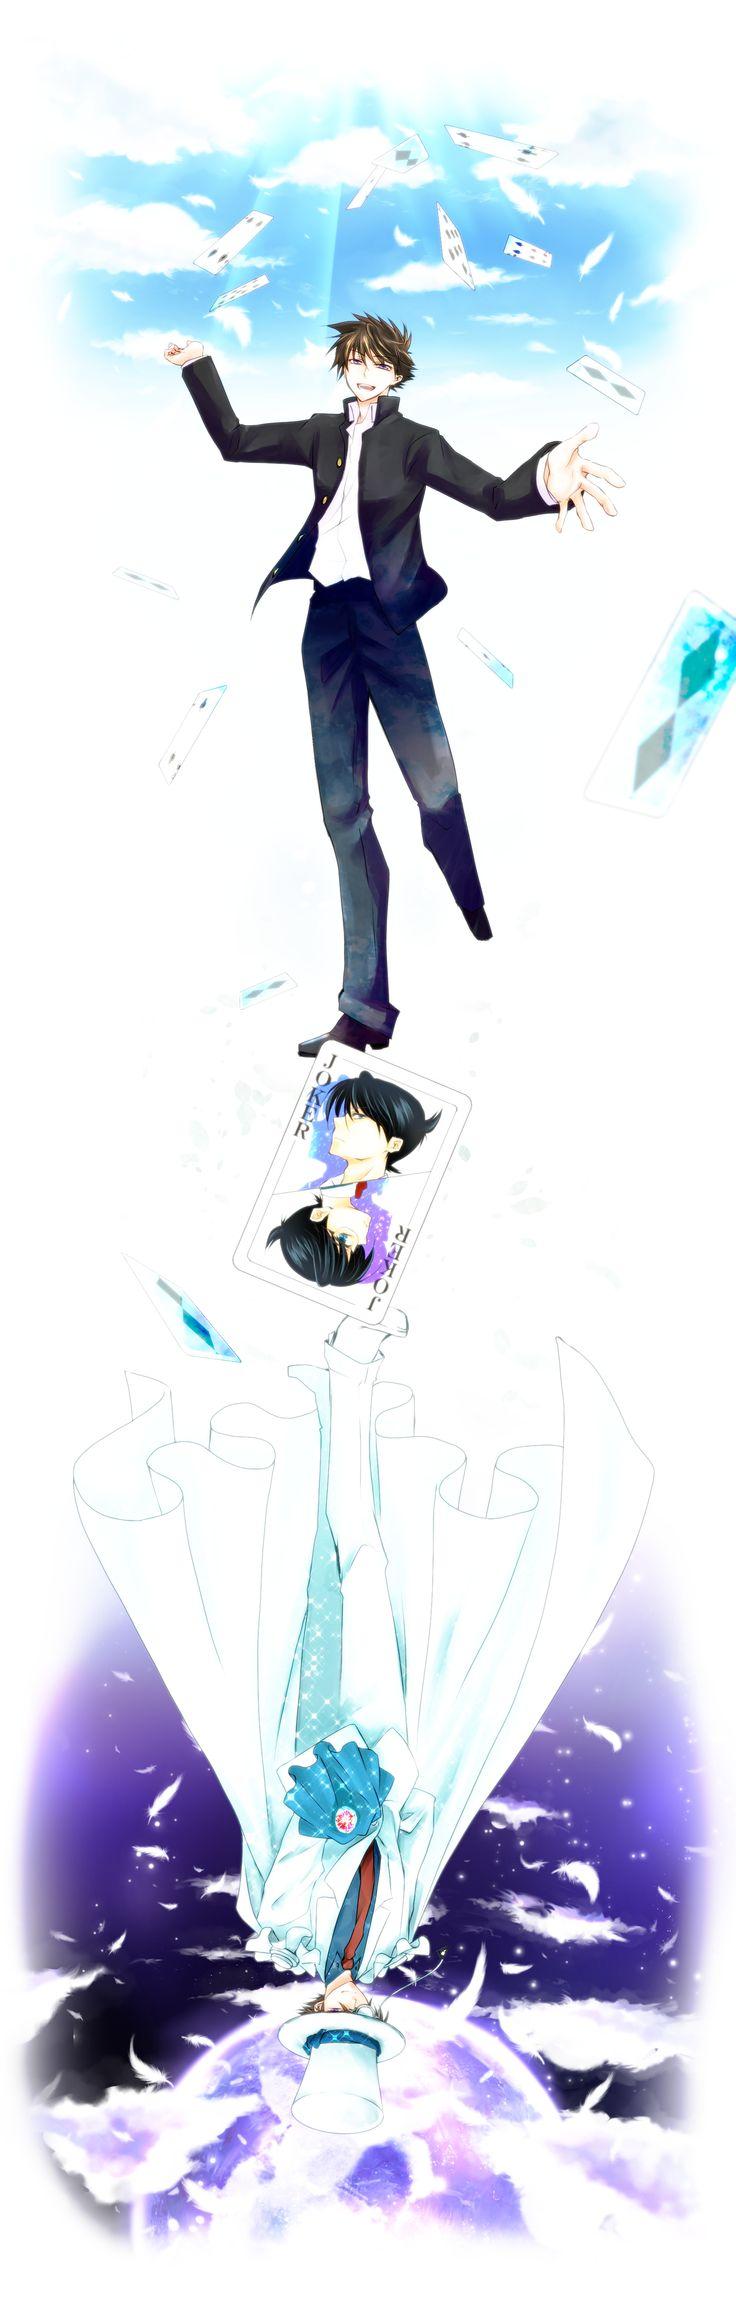 Kaitou Kid and Sinichi Kudo (a.k.a. Conan Edogawa) - Magic Kaito and Detective Conan (Case Closed).